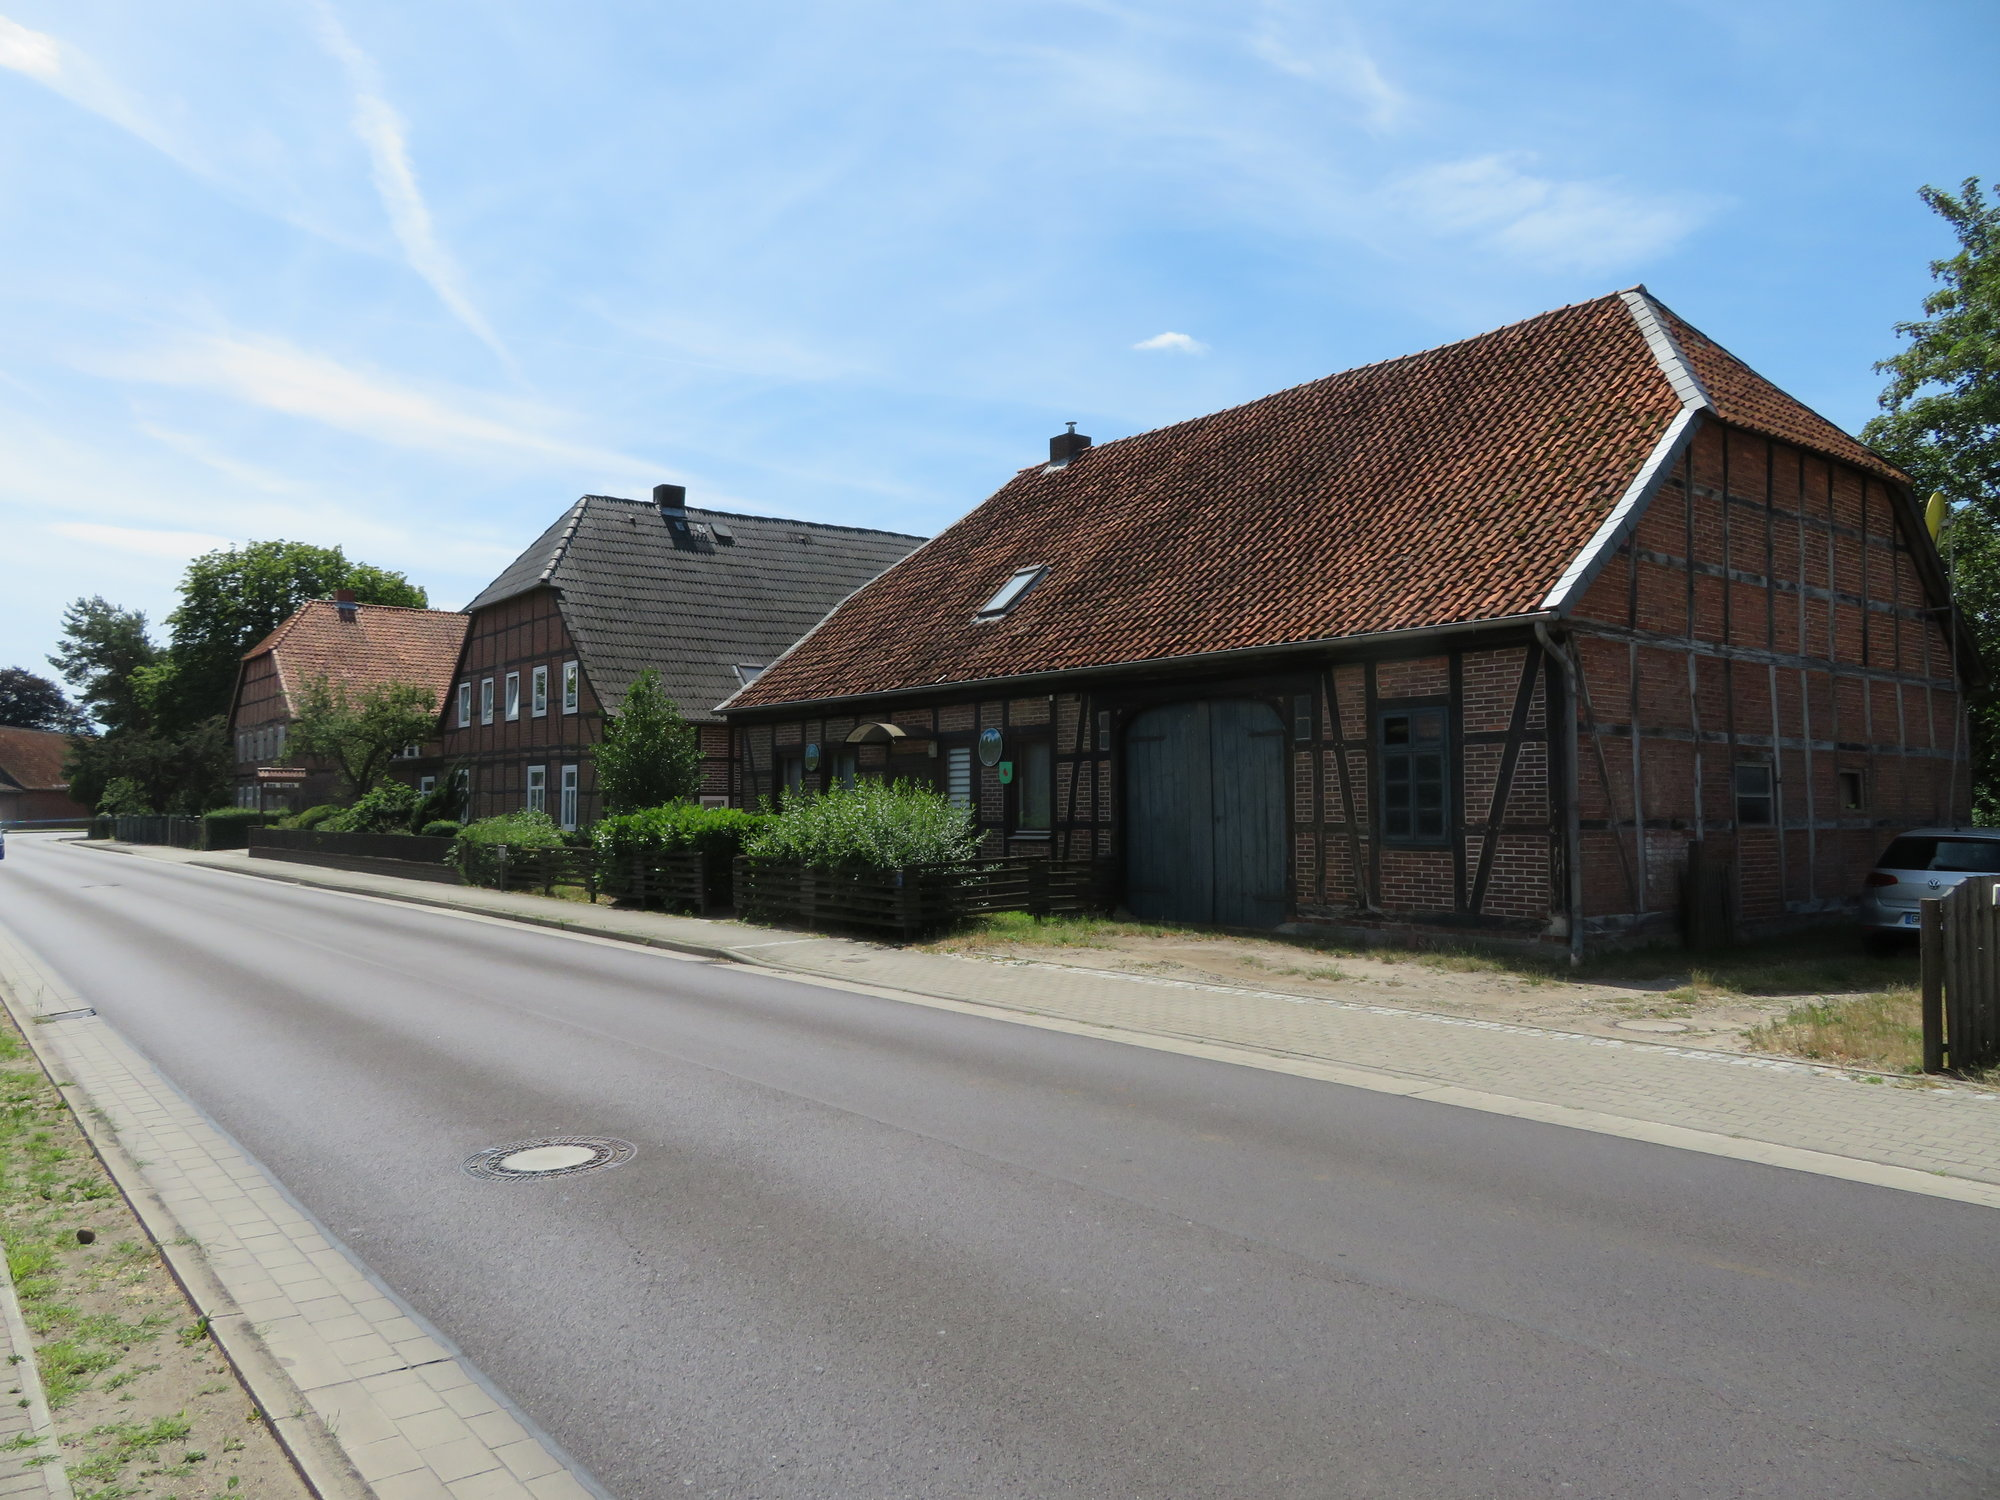 2019-07-04 Houses near Wolfsburg, Germany 2.JPG